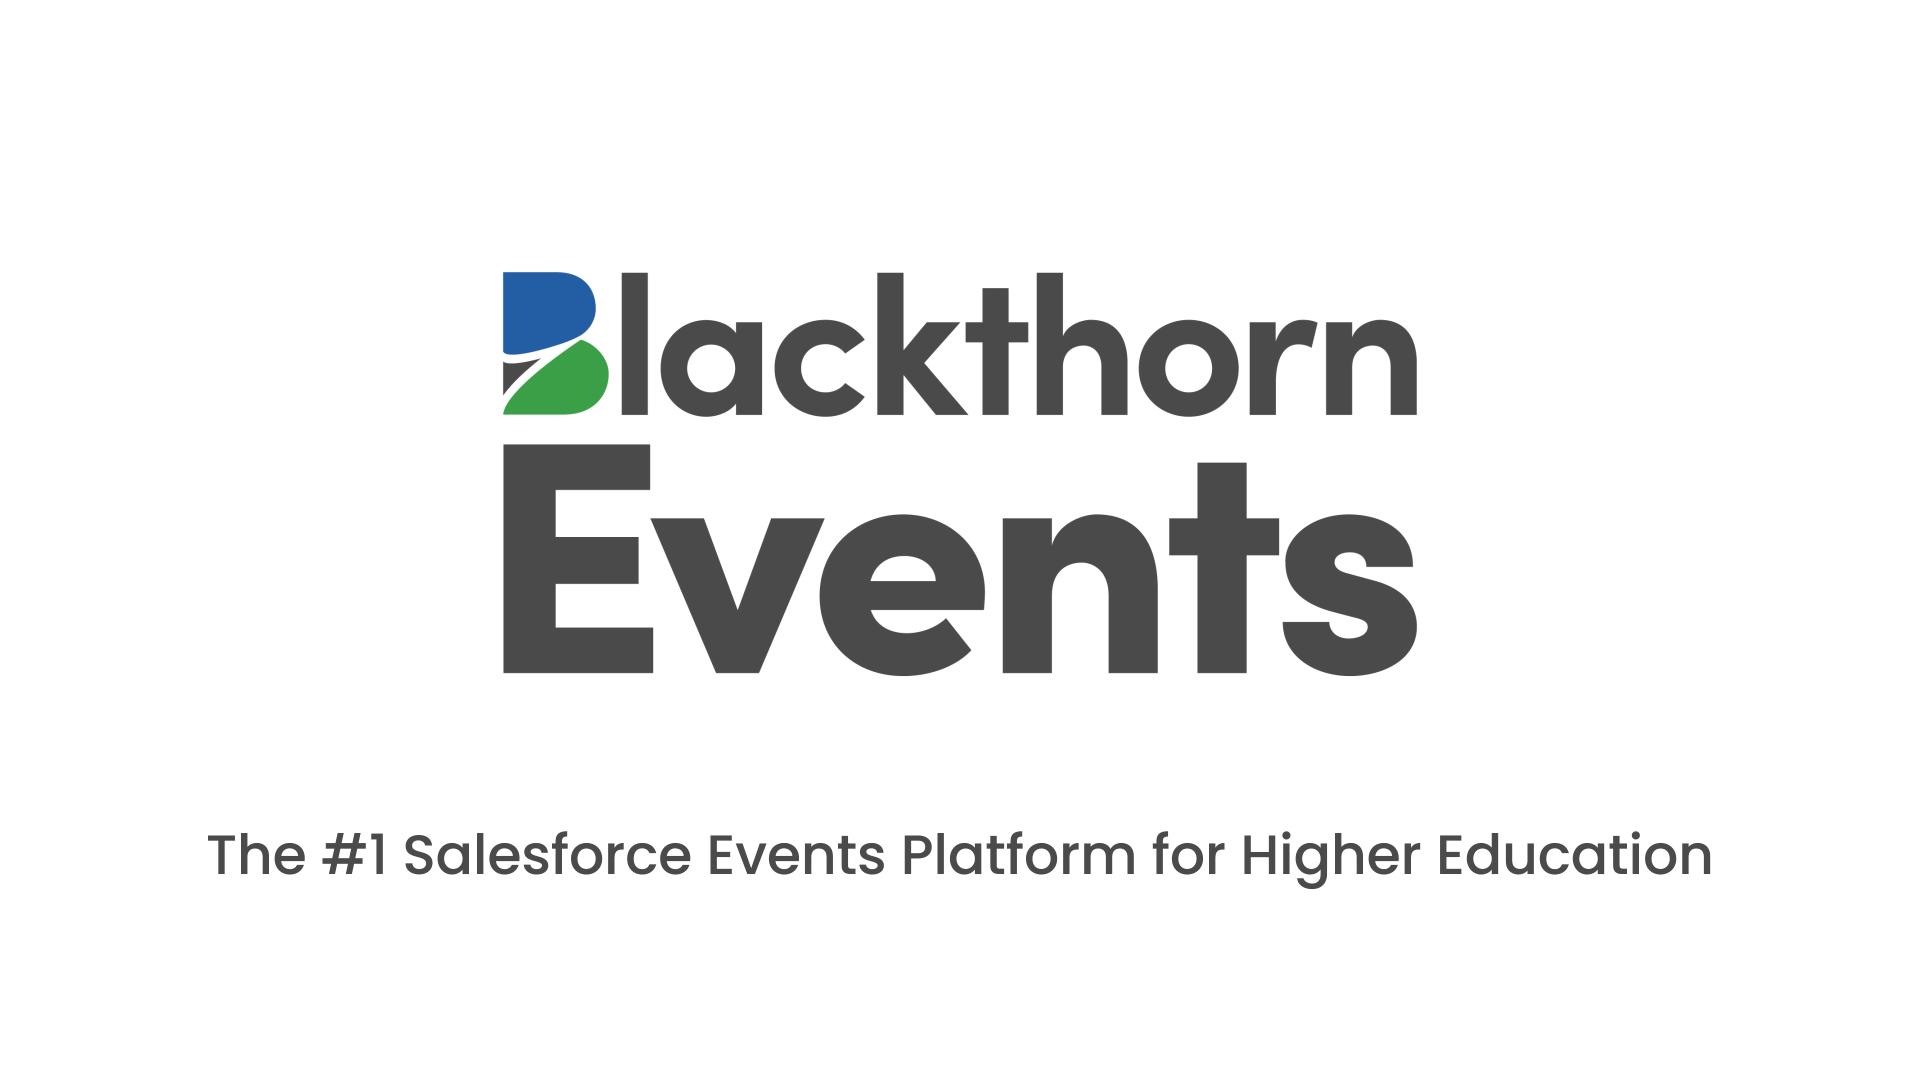 The #1 Salesforce Events Platform for Higher Education